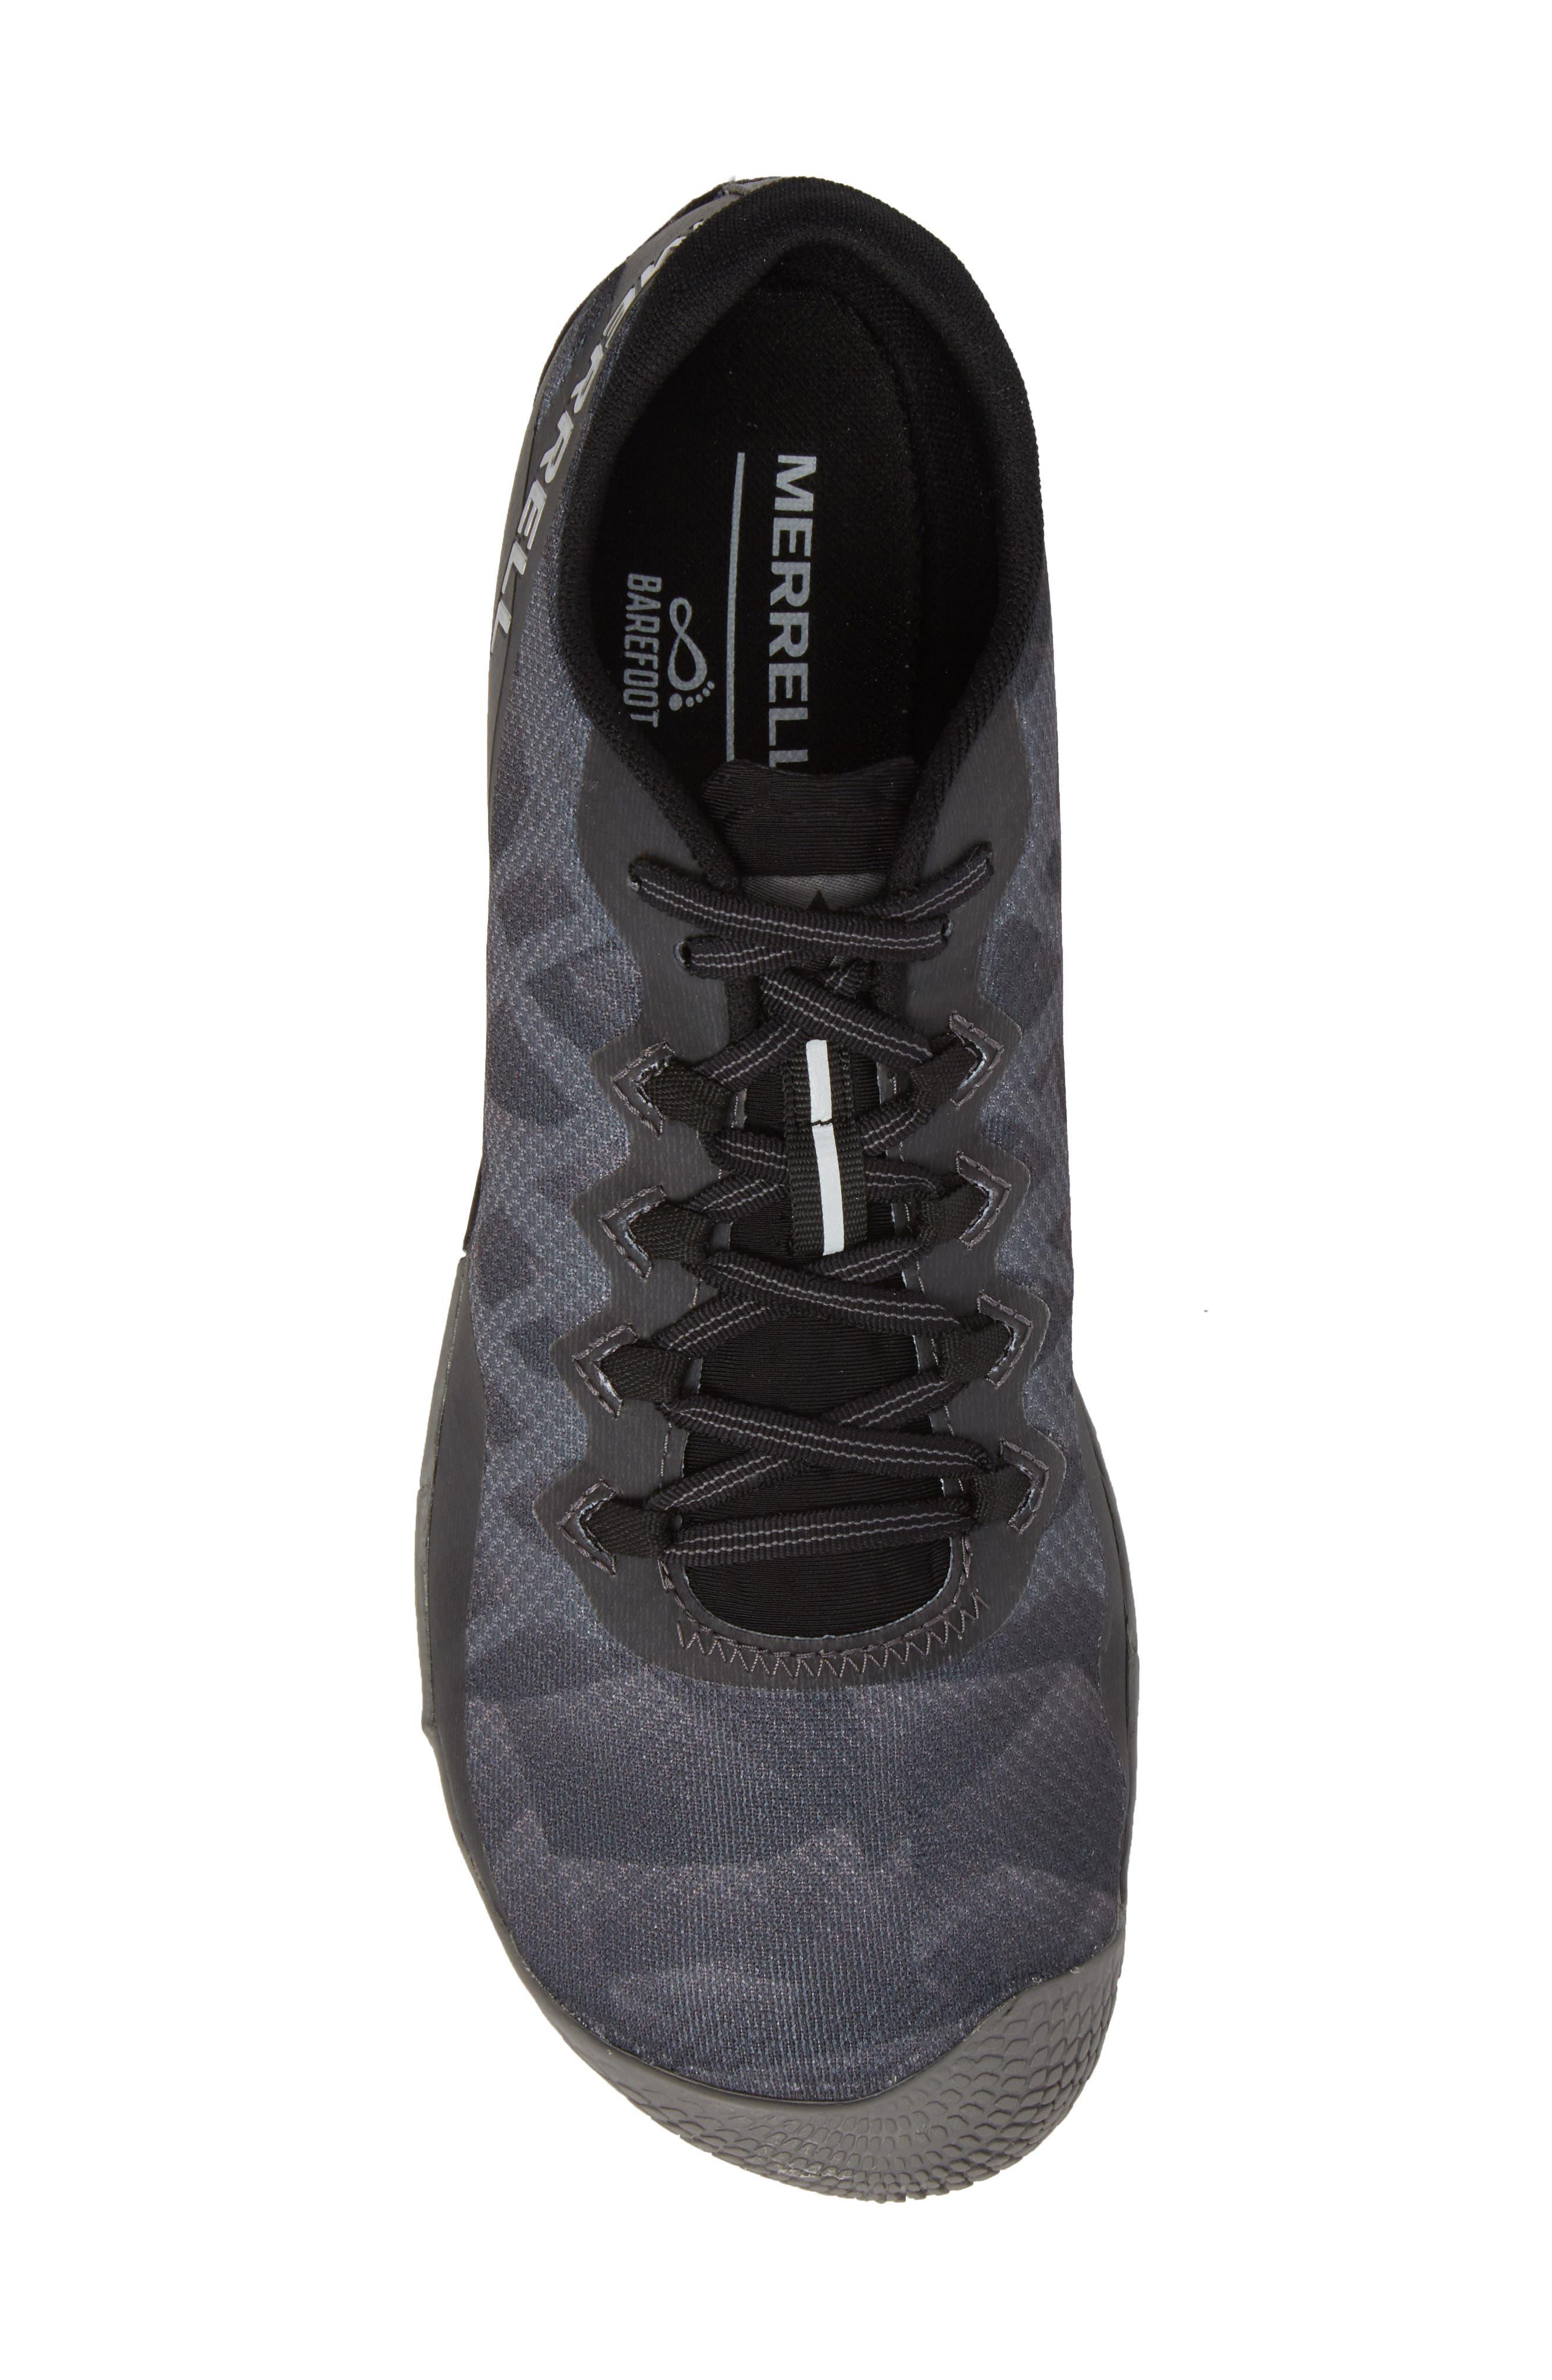 Vapor Glove 3 Trail Running Shoe,                             Alternate thumbnail 5, color,                             BLACK/ SILVER